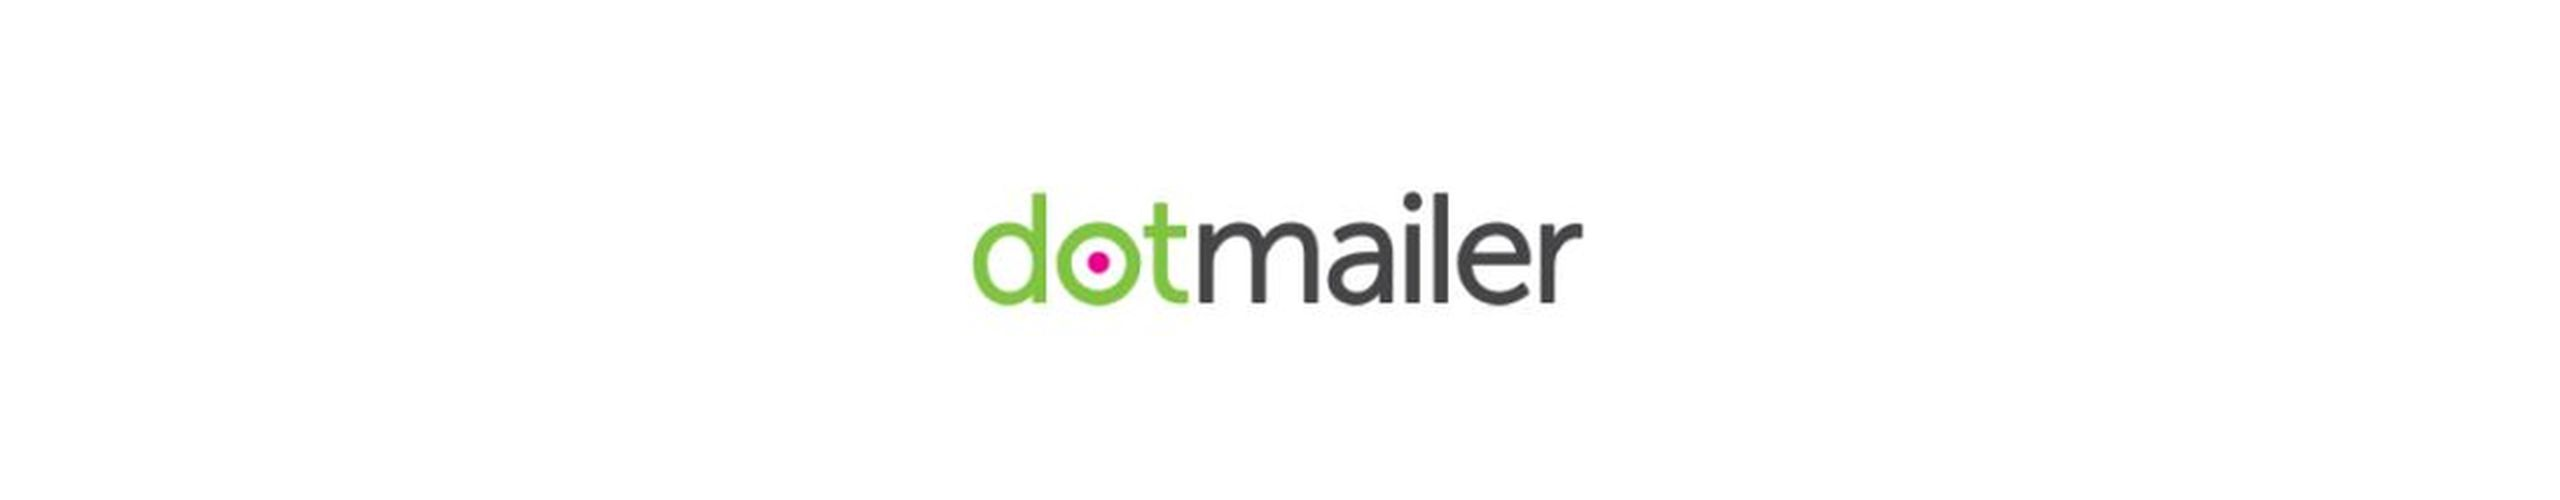 dotmailer-logo